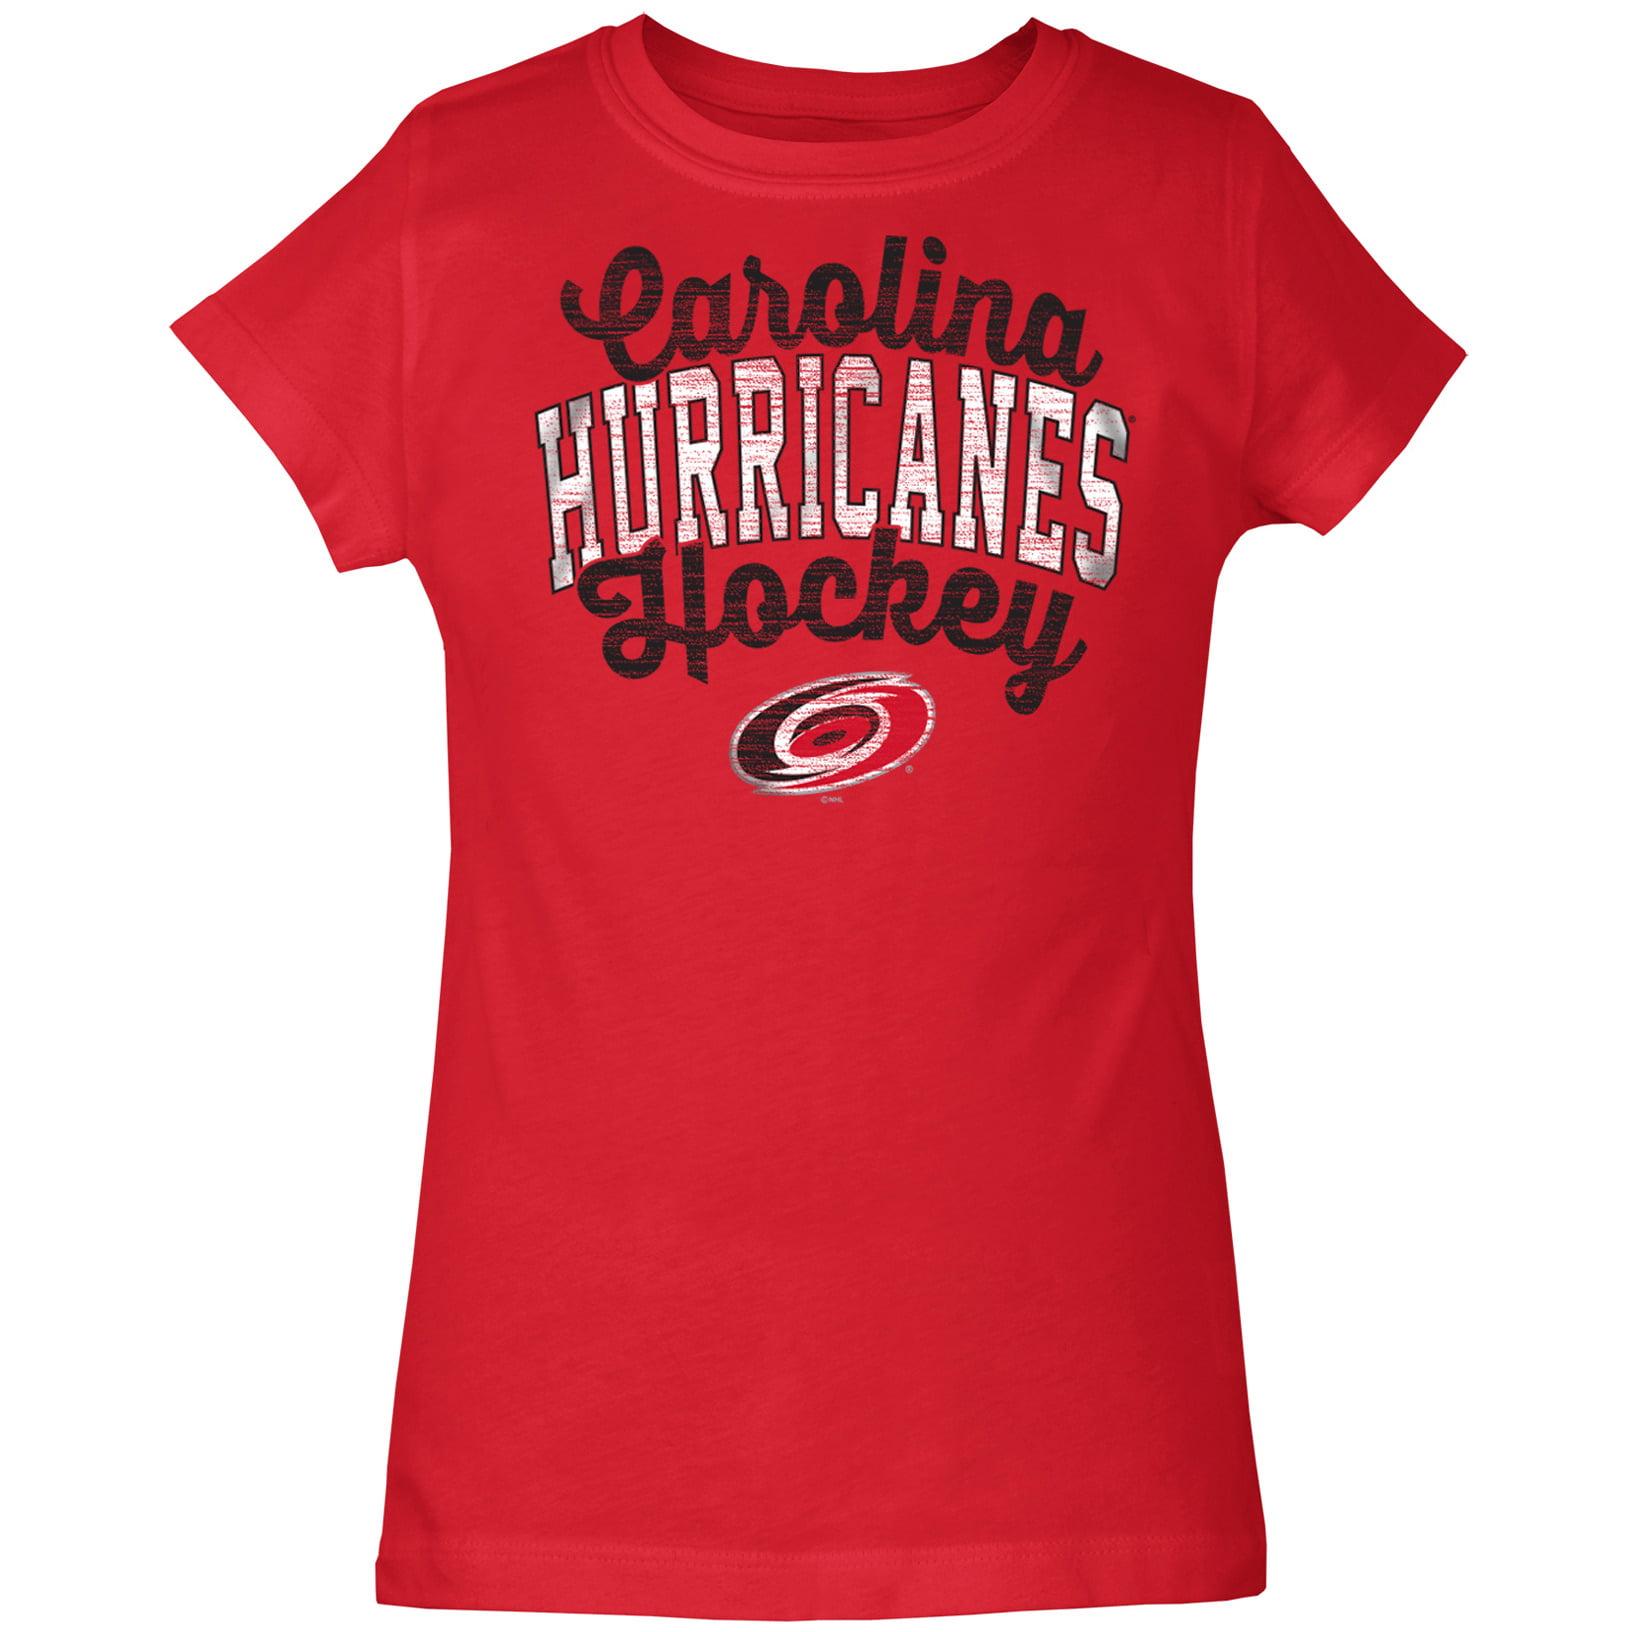 Carolina Hurricanes 5th & Ocean by New Era Girls Youth Baby Jersey T-Shirt - Red